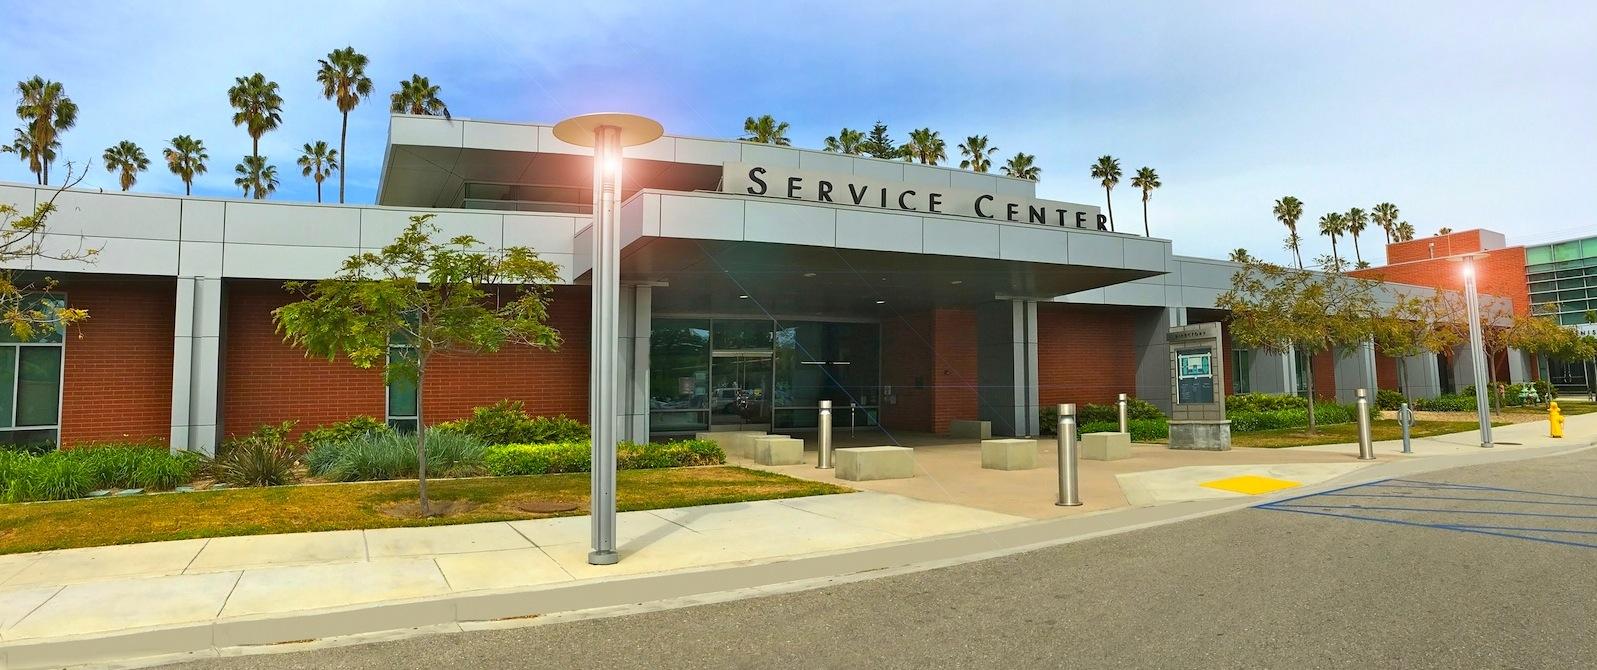 Service Center Parking Lot Entrance